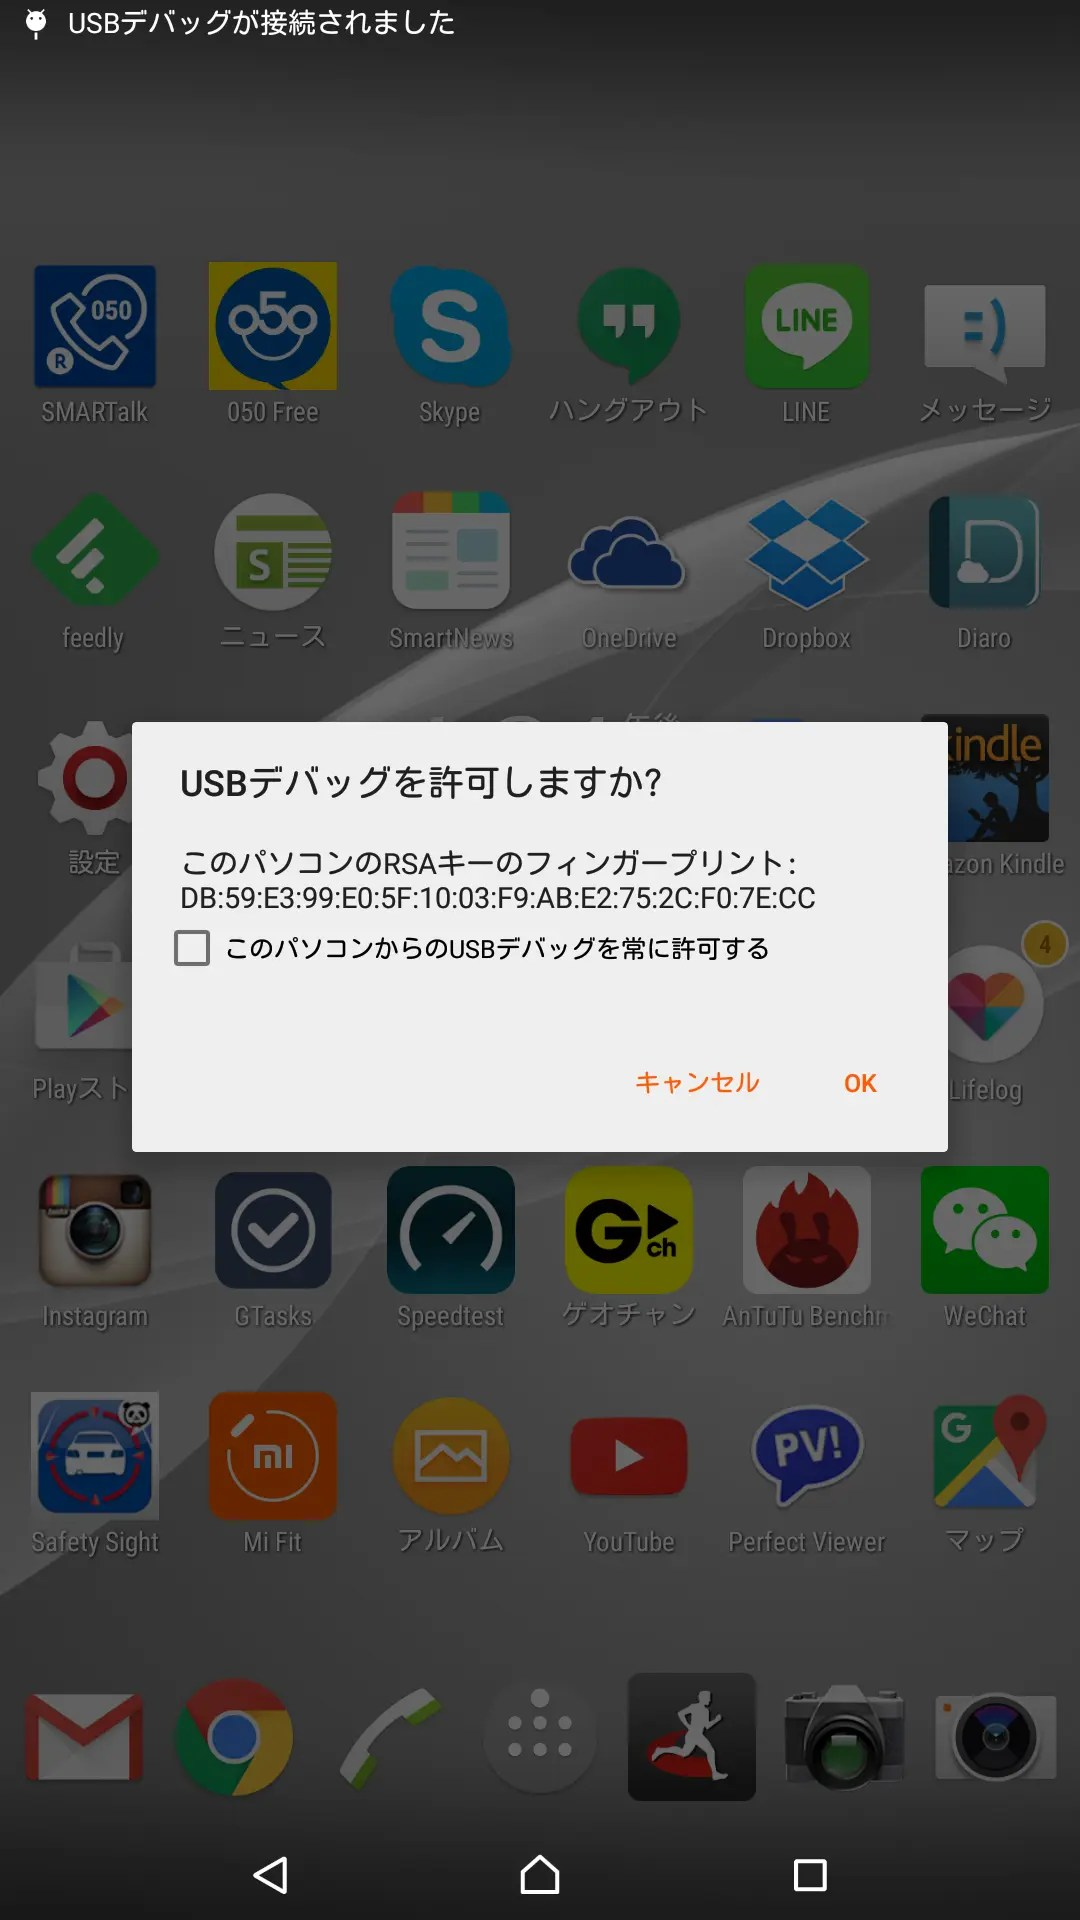 Xperia C5 UltraのUSBデバッグ許可アラート